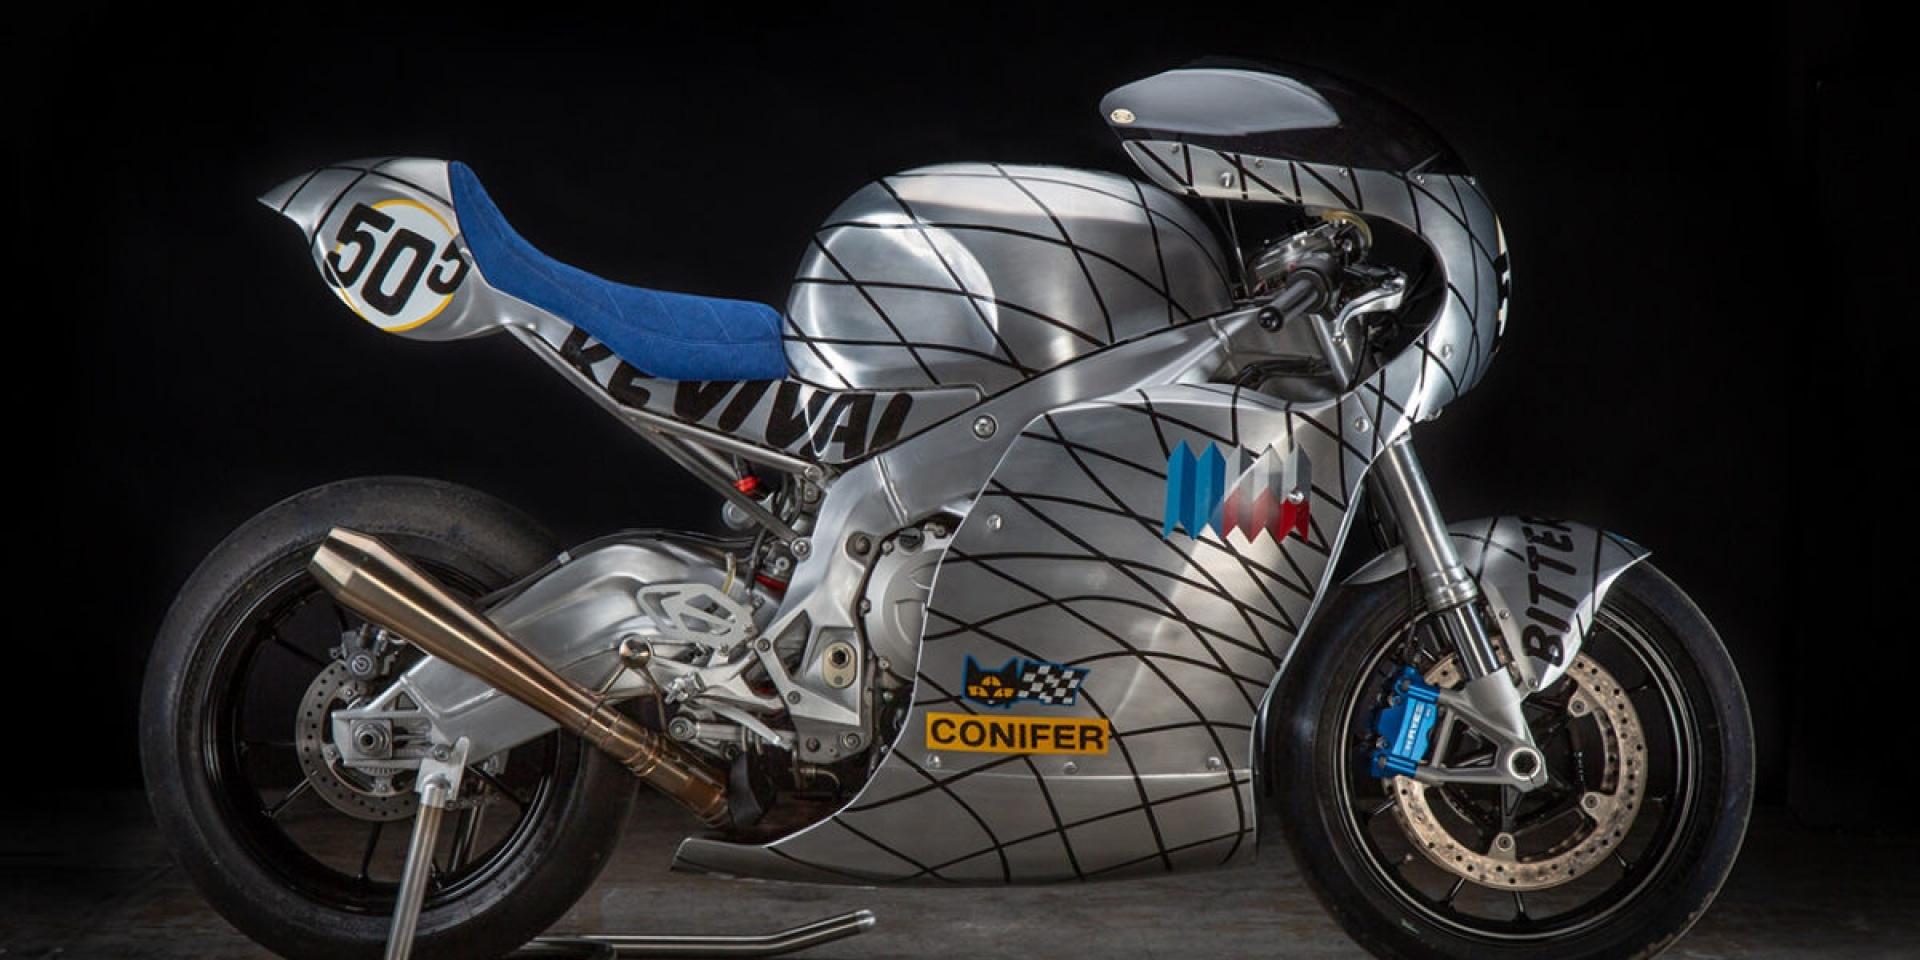 文藝,以金屬之名復興- BMW S1000RR by Revival